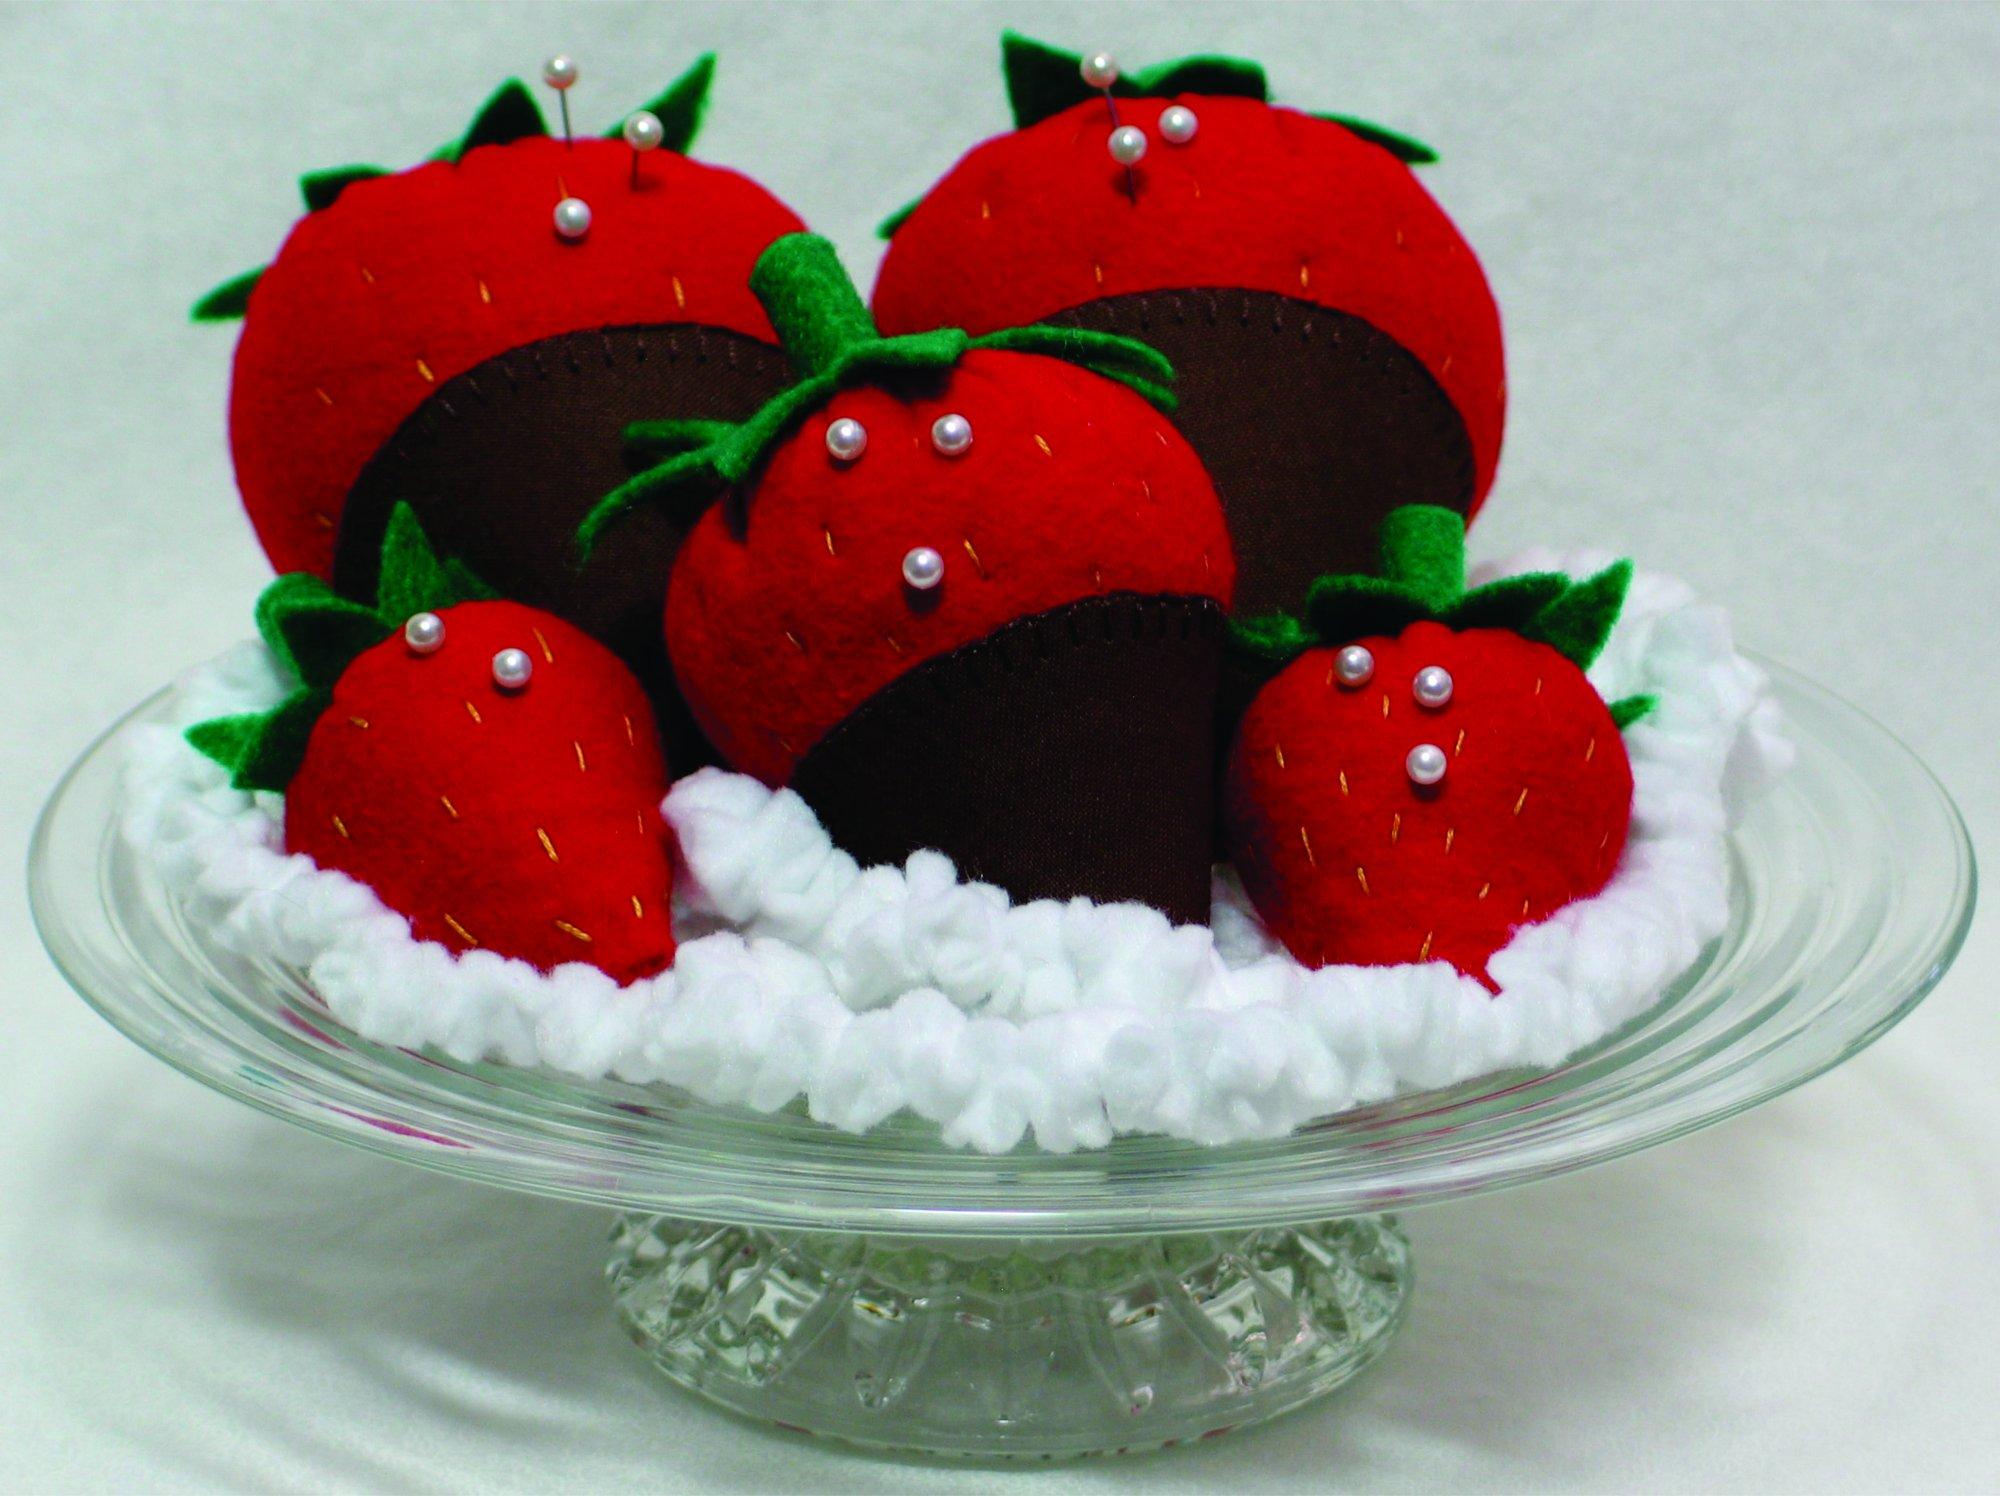 Chocolate Strawberries #ST-930  (Download)